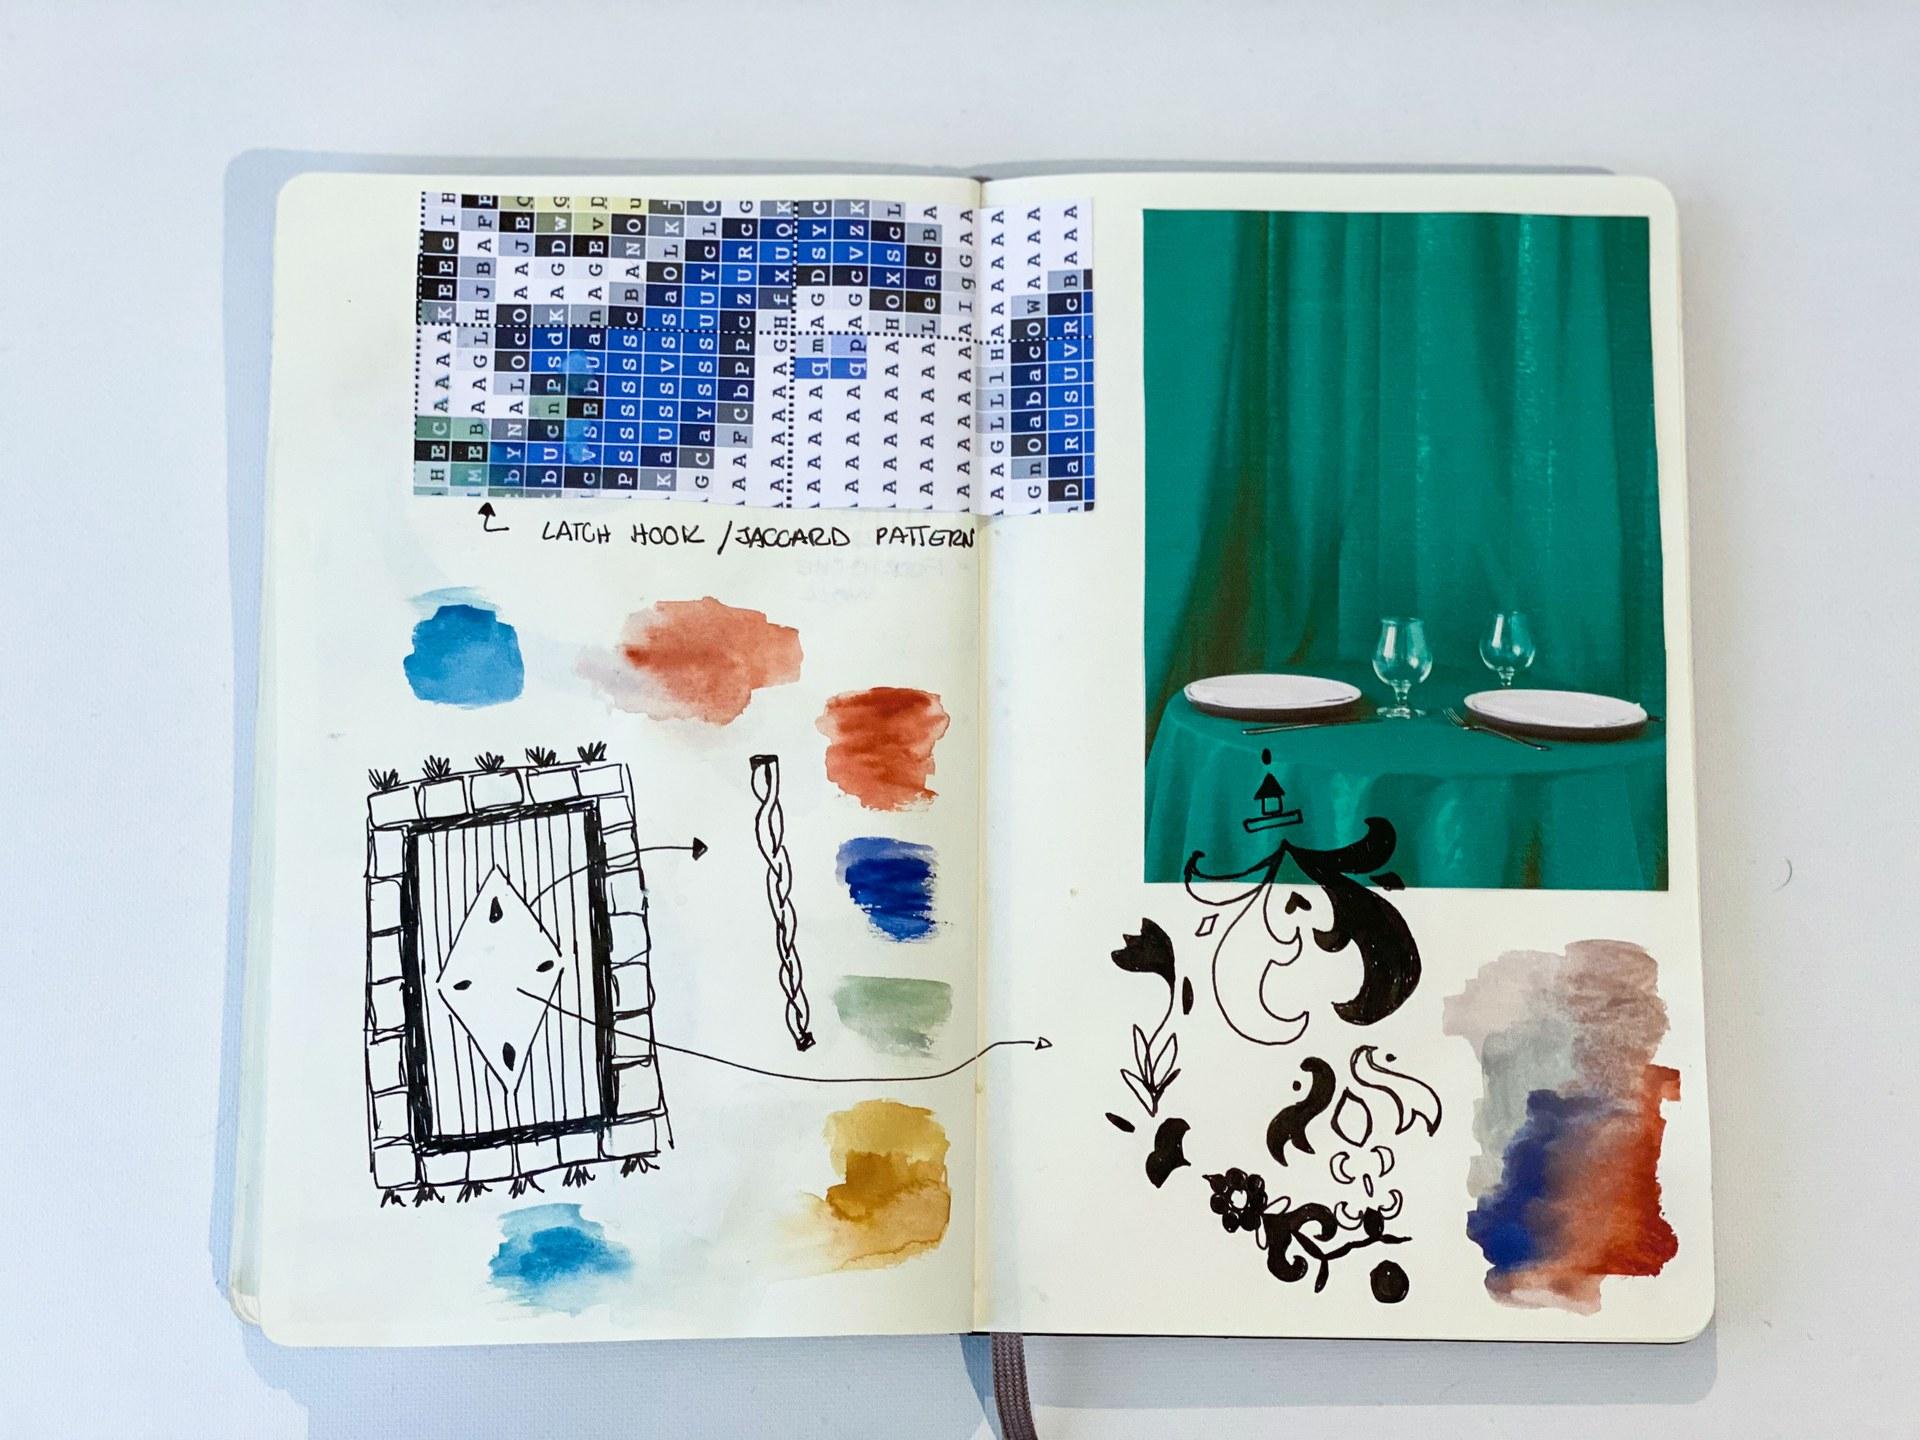 Untitled Handmade Collage